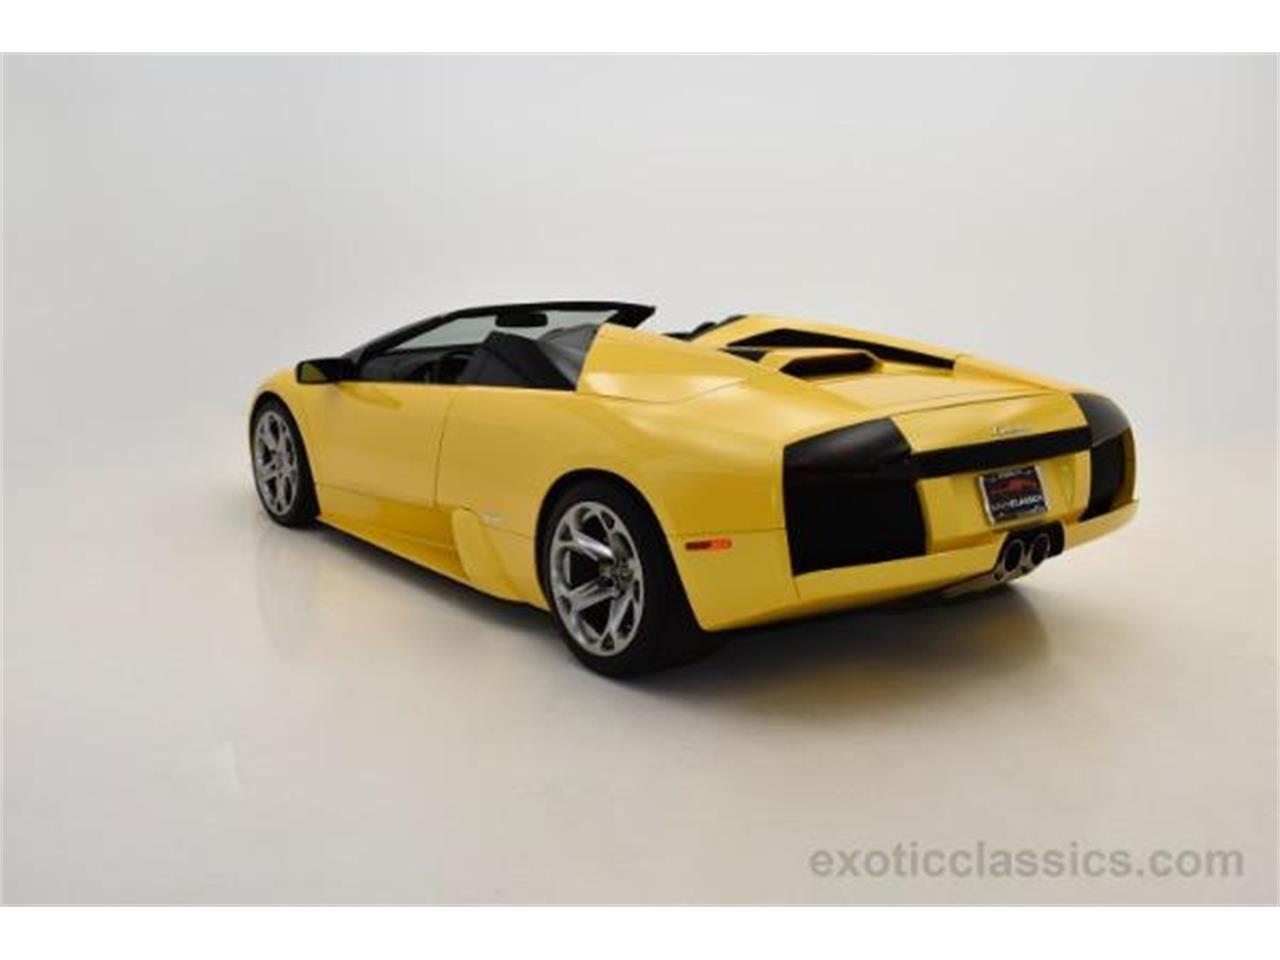 Large Picture of 2005 Lamborghini Murcielago located in New York - $159,000.00 - L6CF